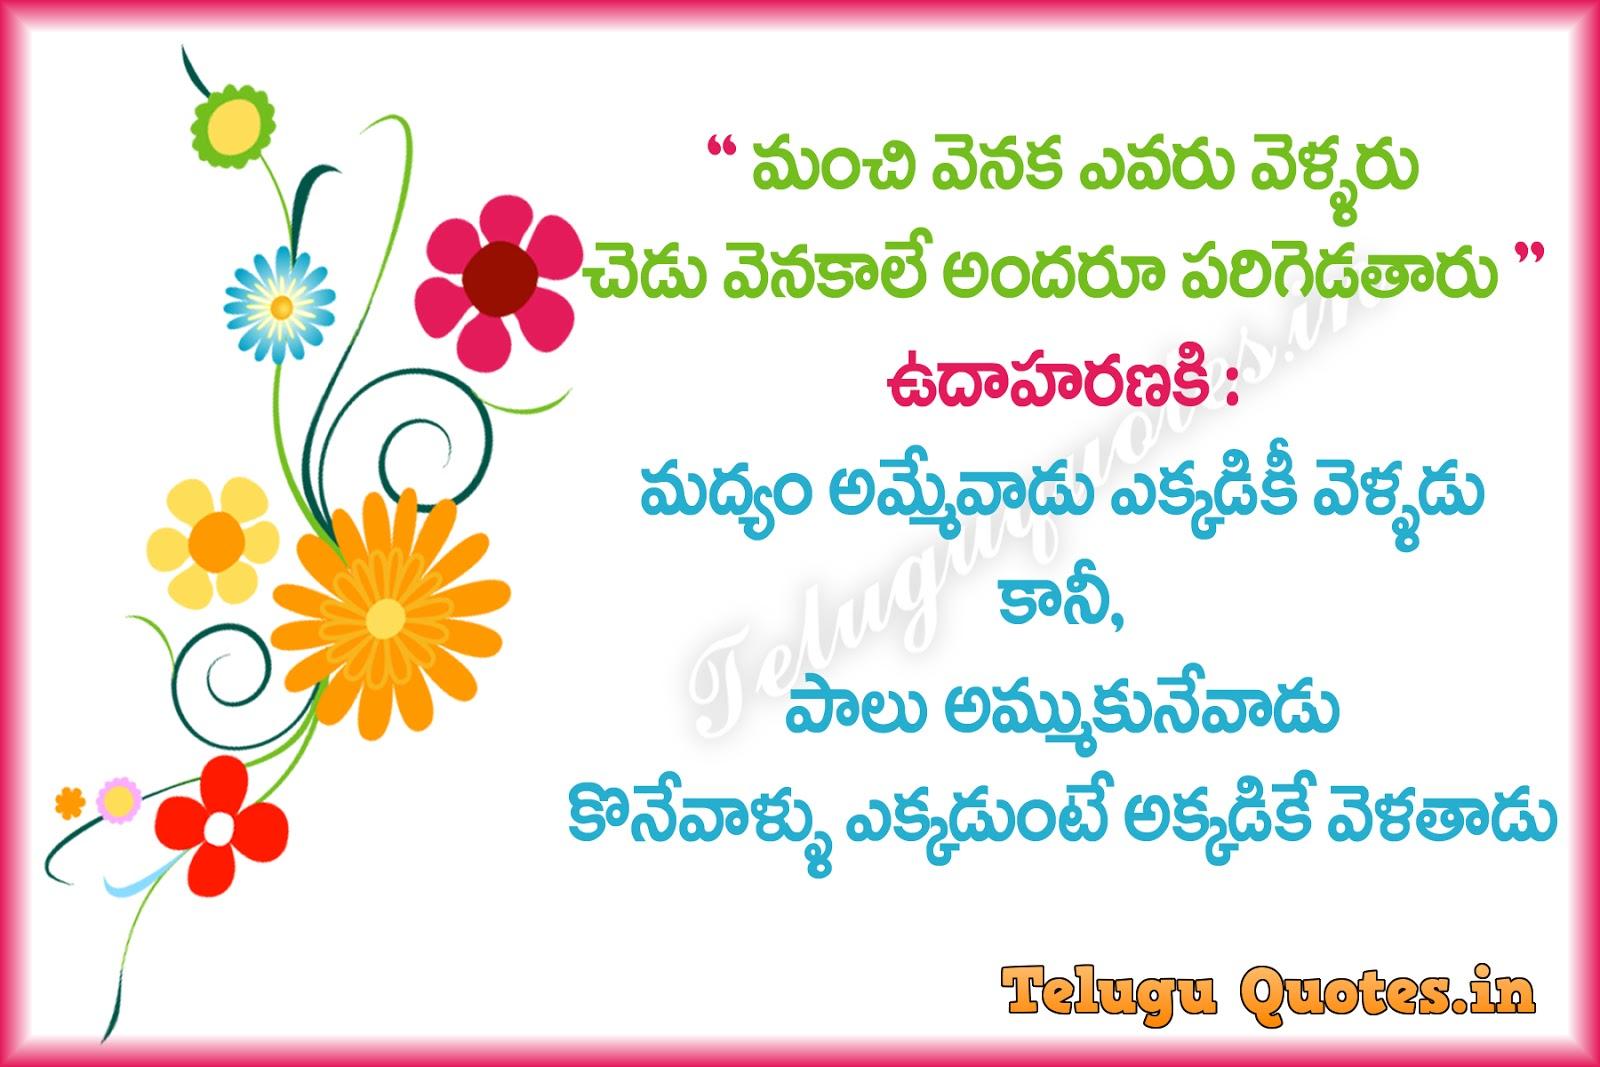 motivational life quotes in telugu images telugu